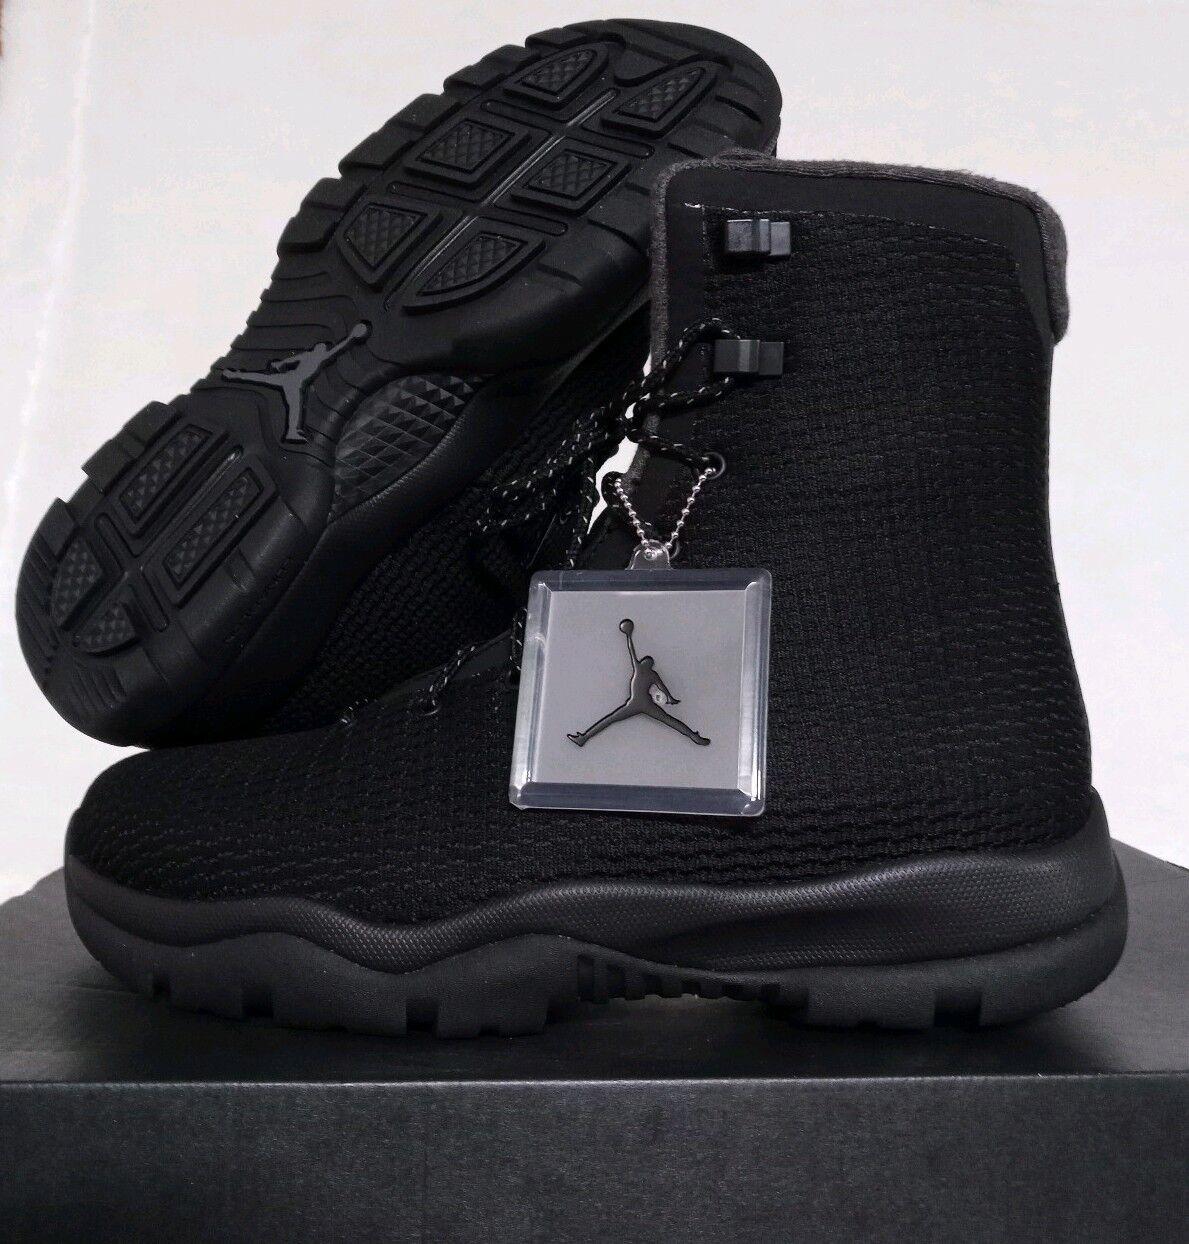 SIZE 9 MEN'S NIKE AIR JORDAN BLACK FUTURE BOOTS 854554 002 BLACK JORDAN DARK GREY WATERPROOF c59b91